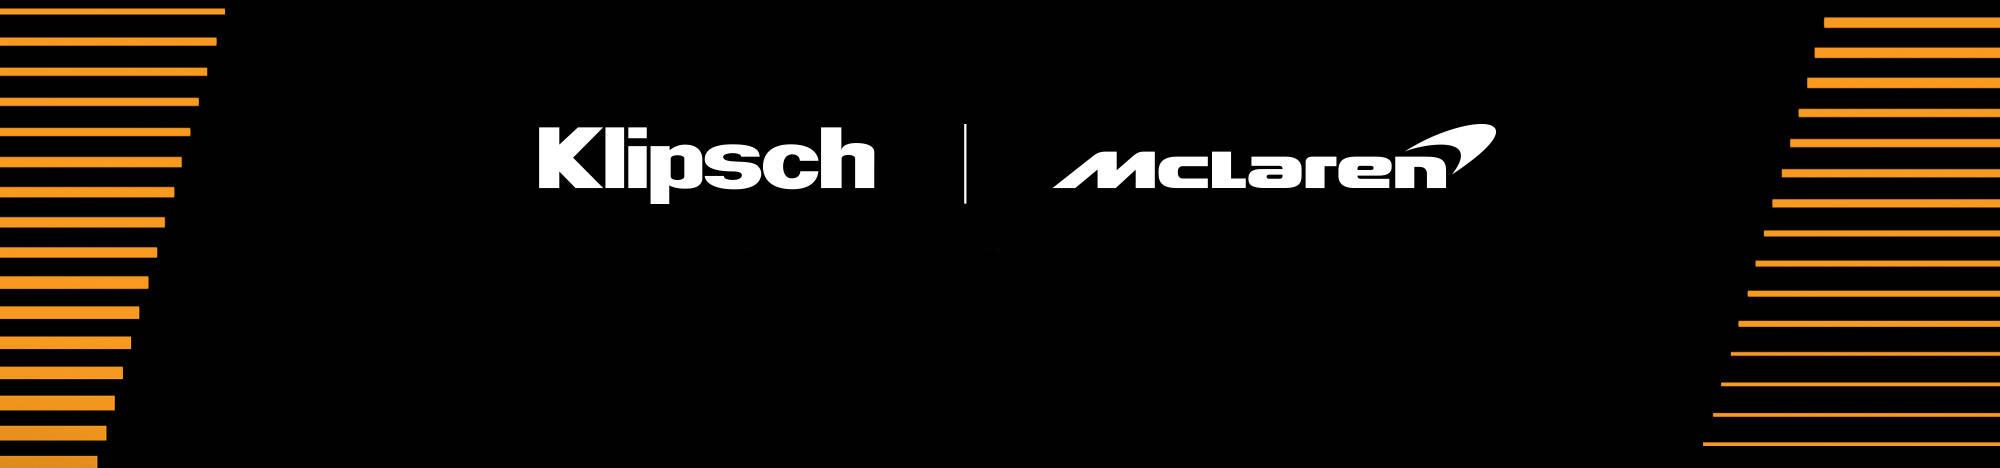 Klipsch and Mc Laren Welcome to the Speed of Sound Desktop